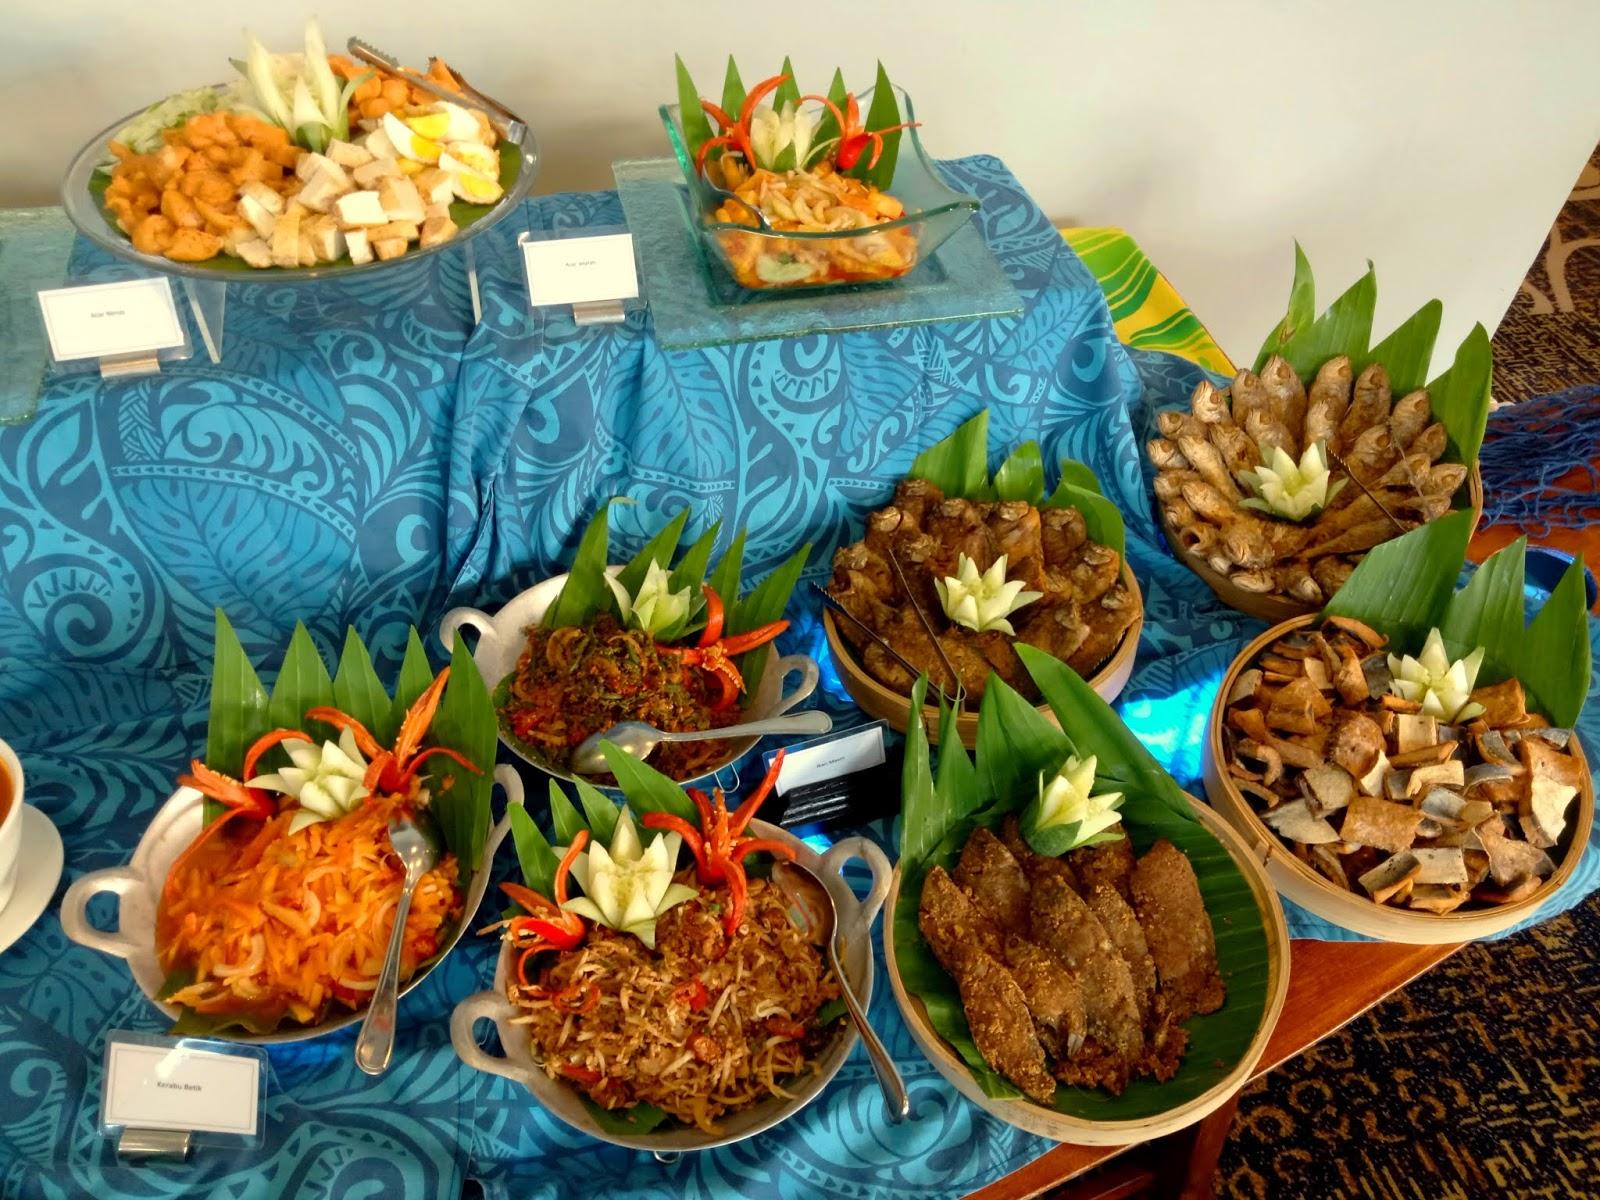 Penang Food For Thought: Vistana